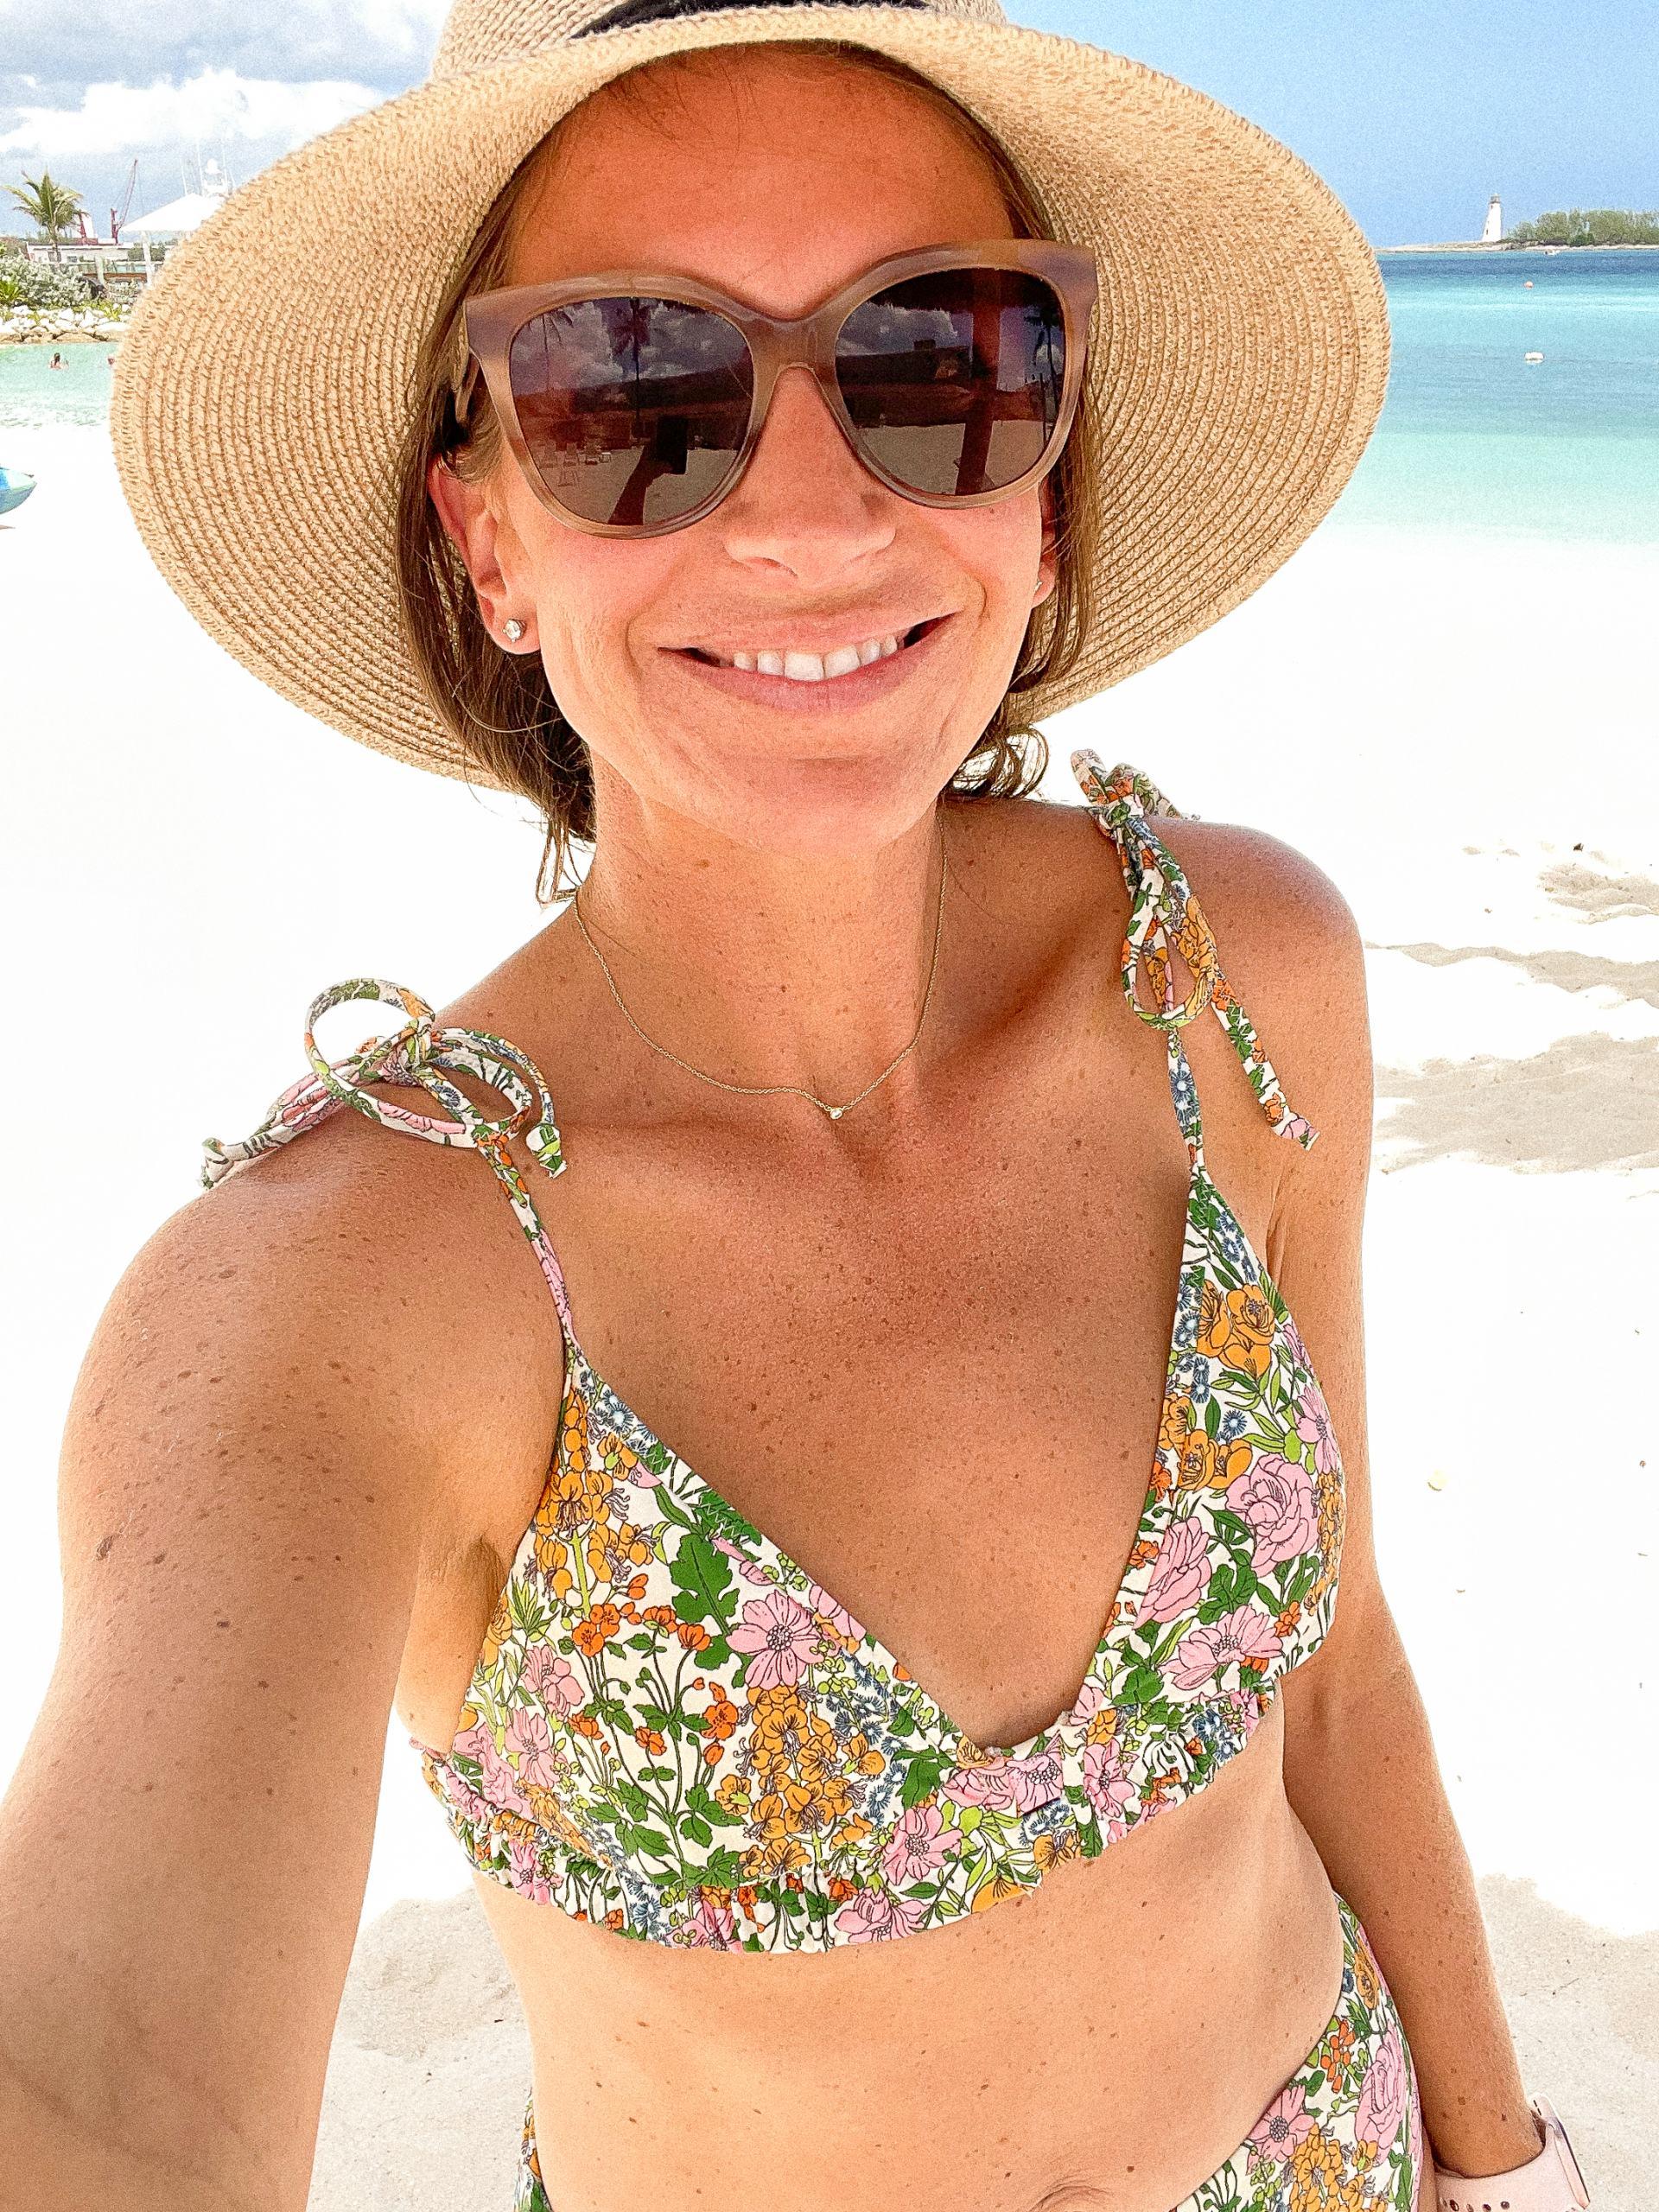 liberty print bikini - packable sunhat - mohala eyewear sunglasses - resort wear - classic style